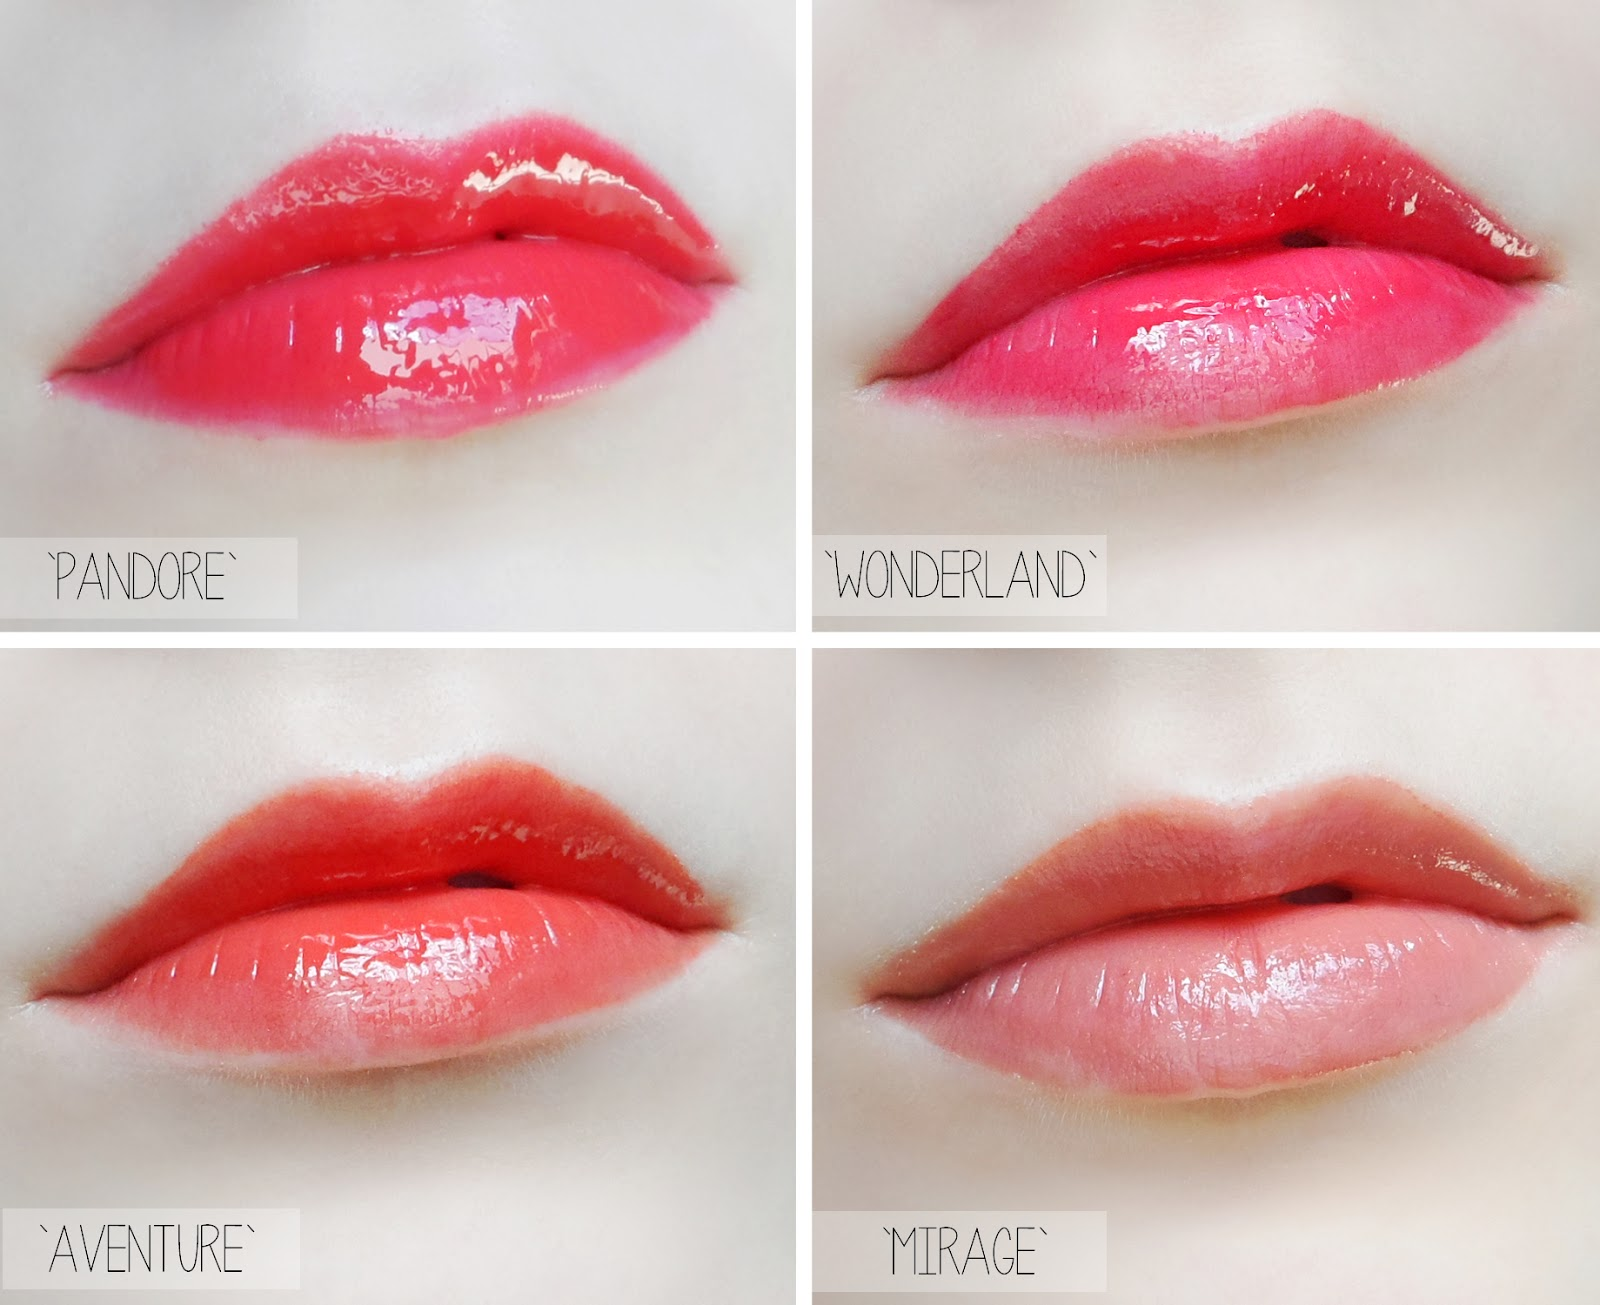 dior addict lipstick fluid stick review pictures swatches blogger liz breygel lips